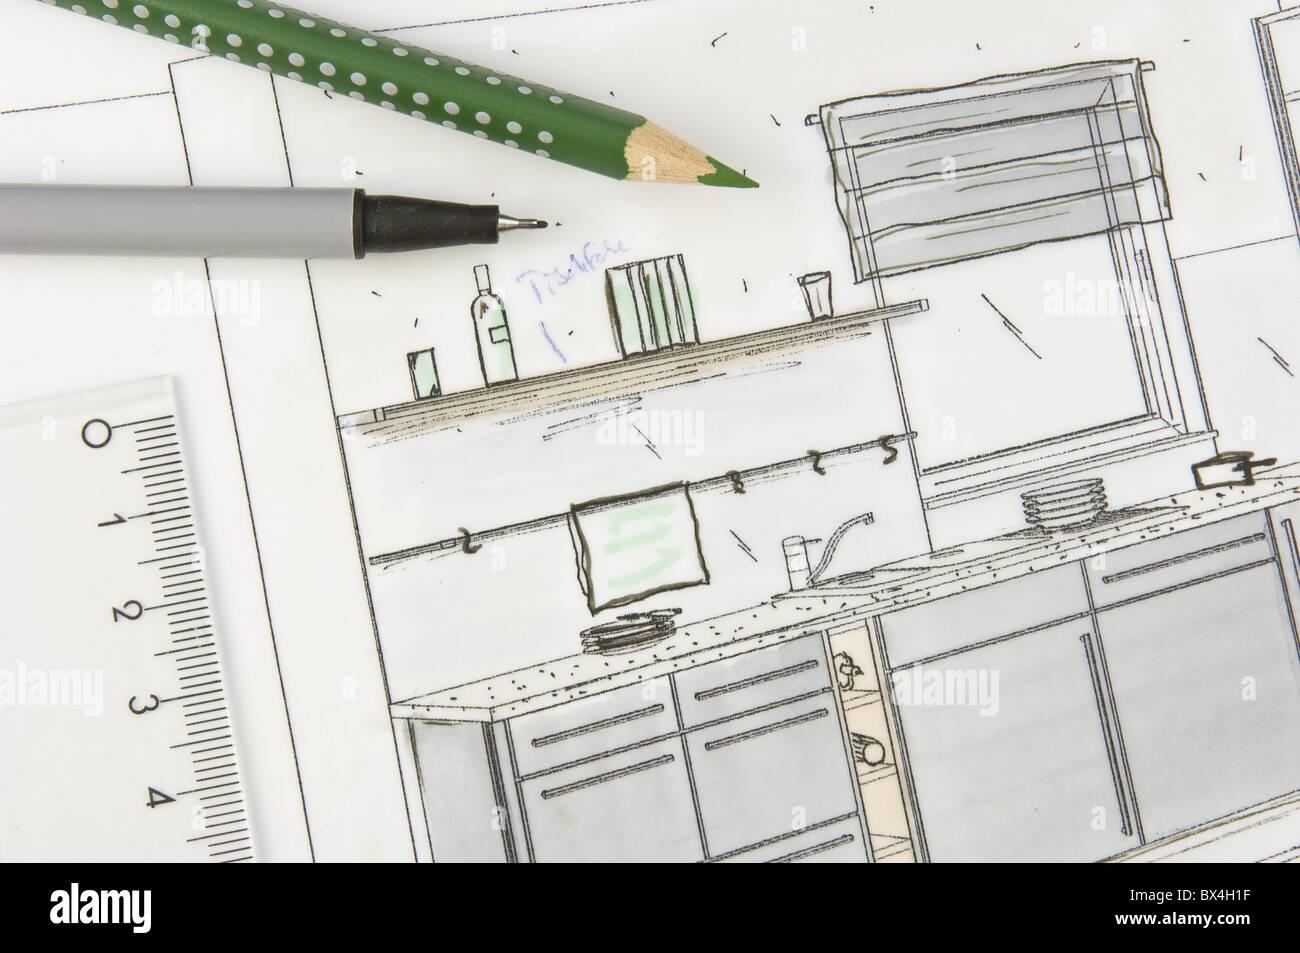 kitchen space planning Stock Photo